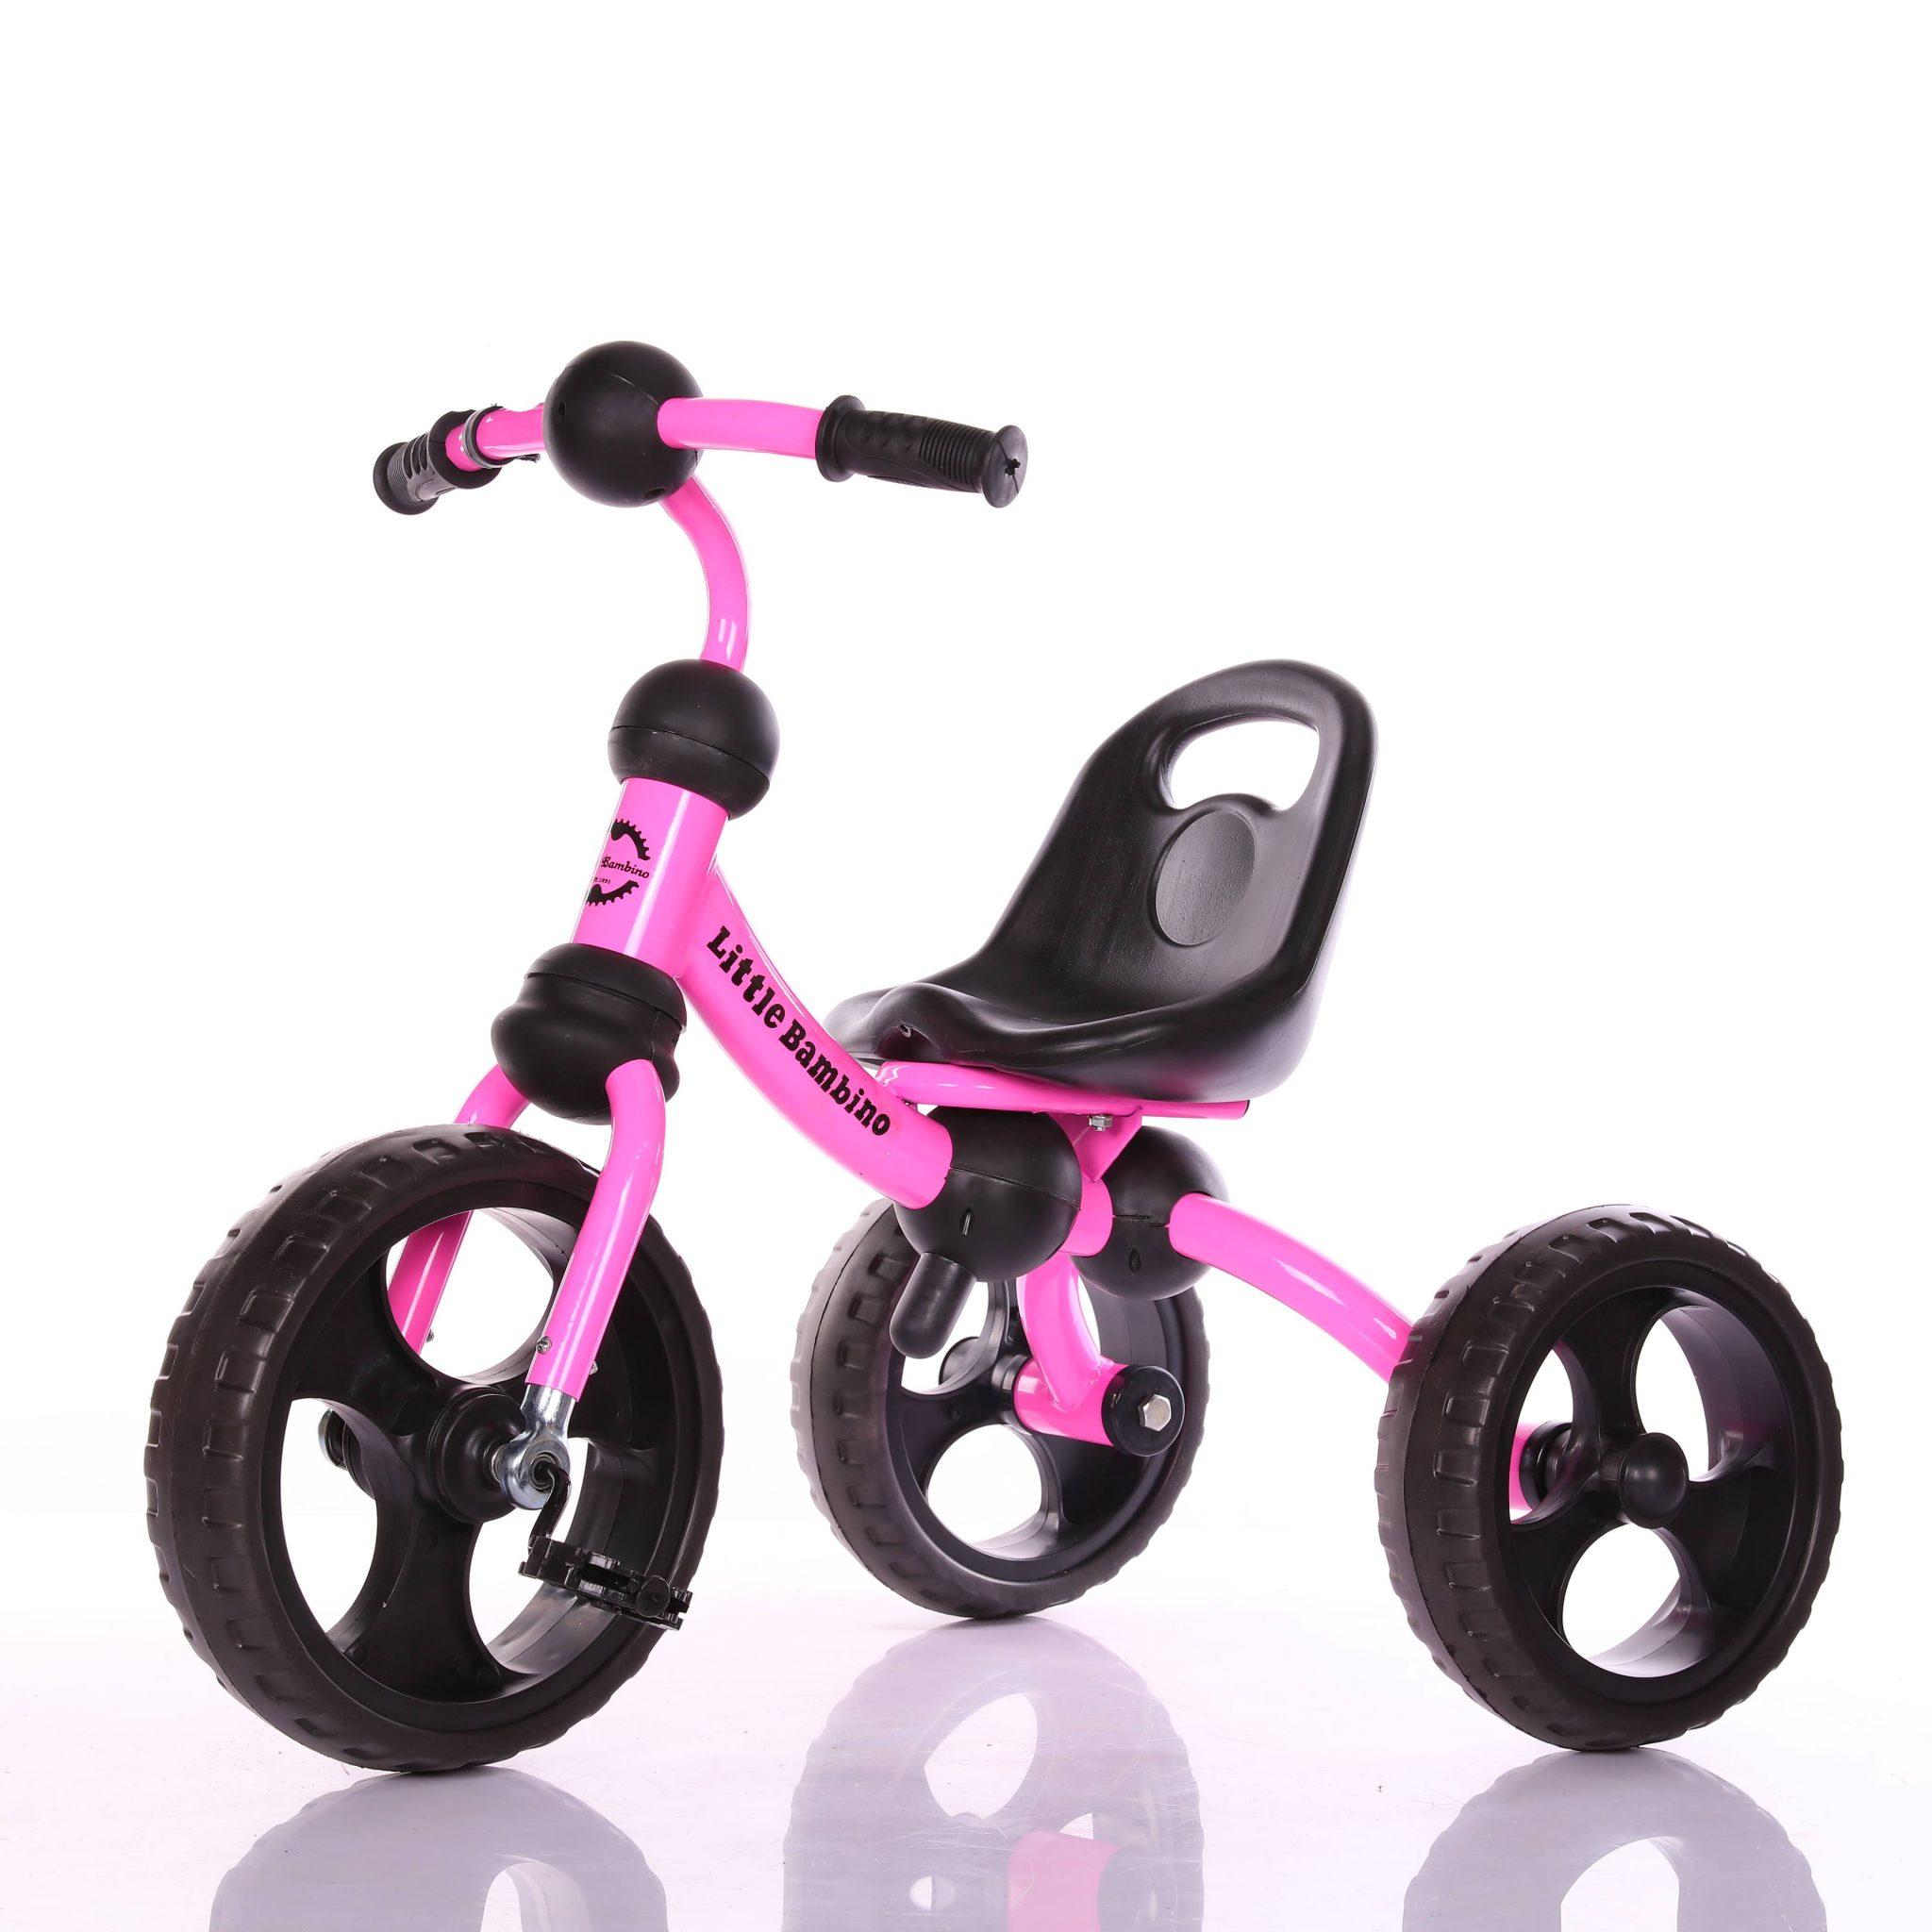 pink 3 wheeler trike learn to ride